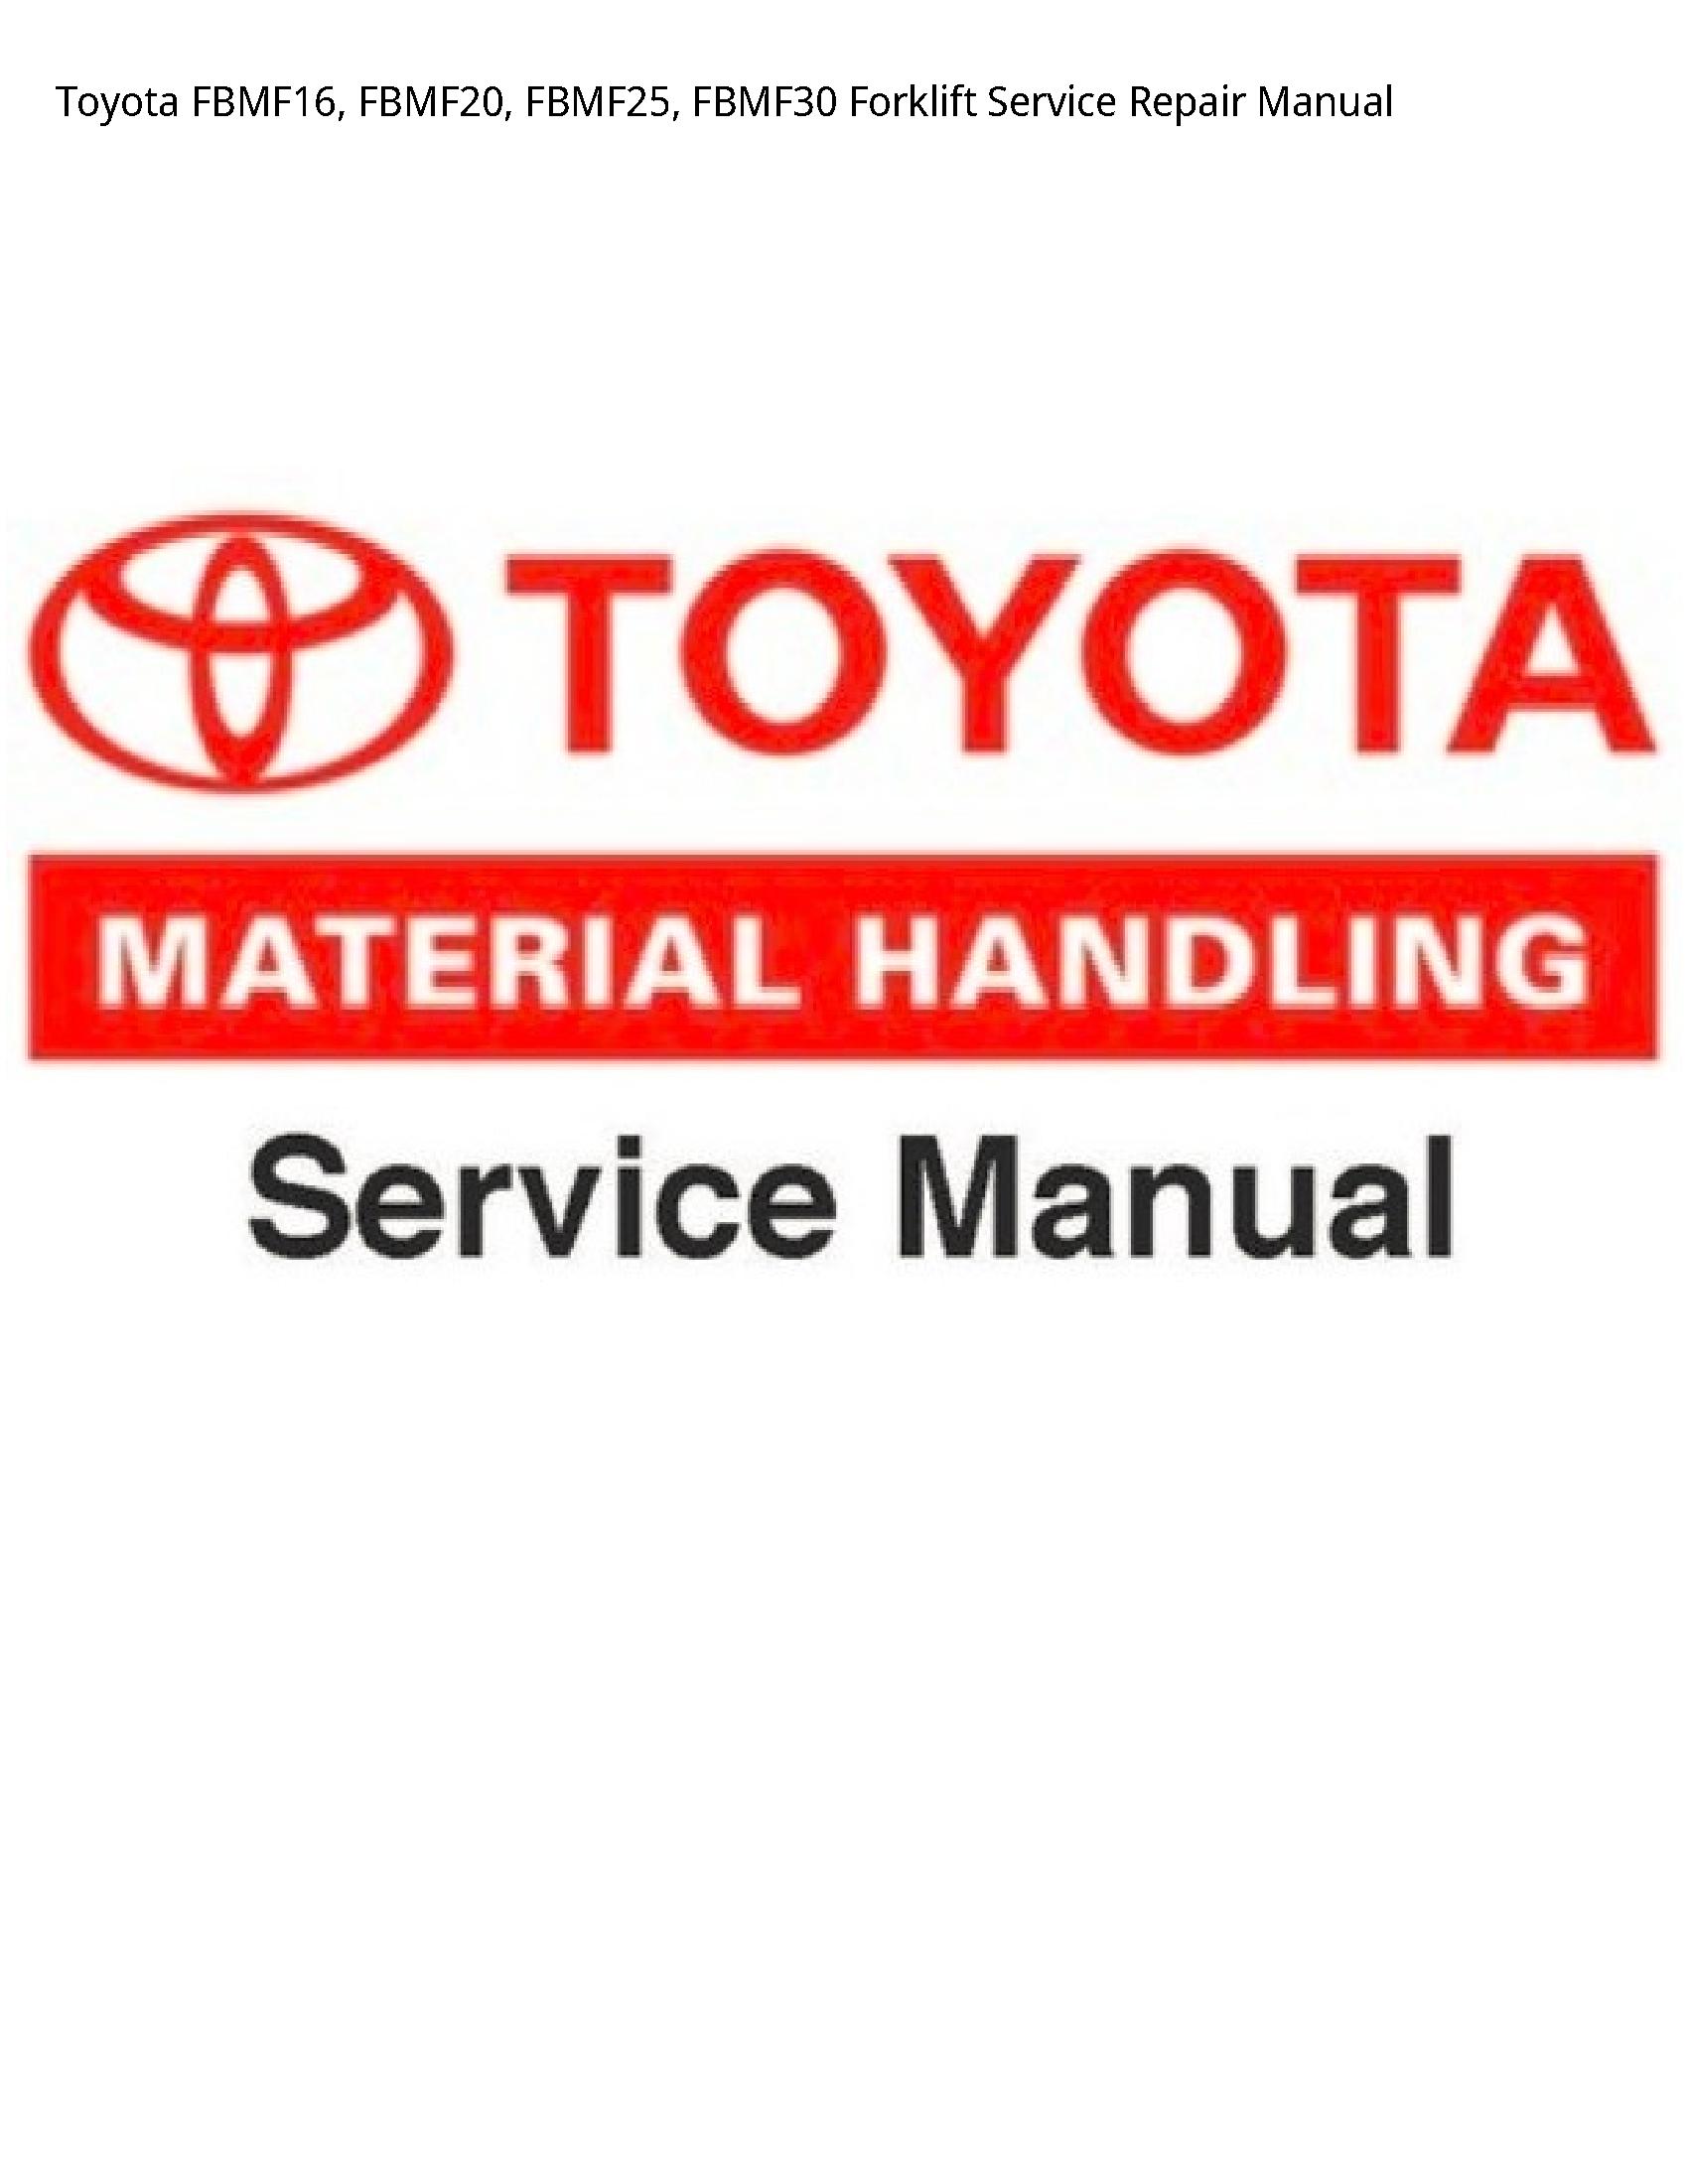 Toyota FBMF16 Forklift manual